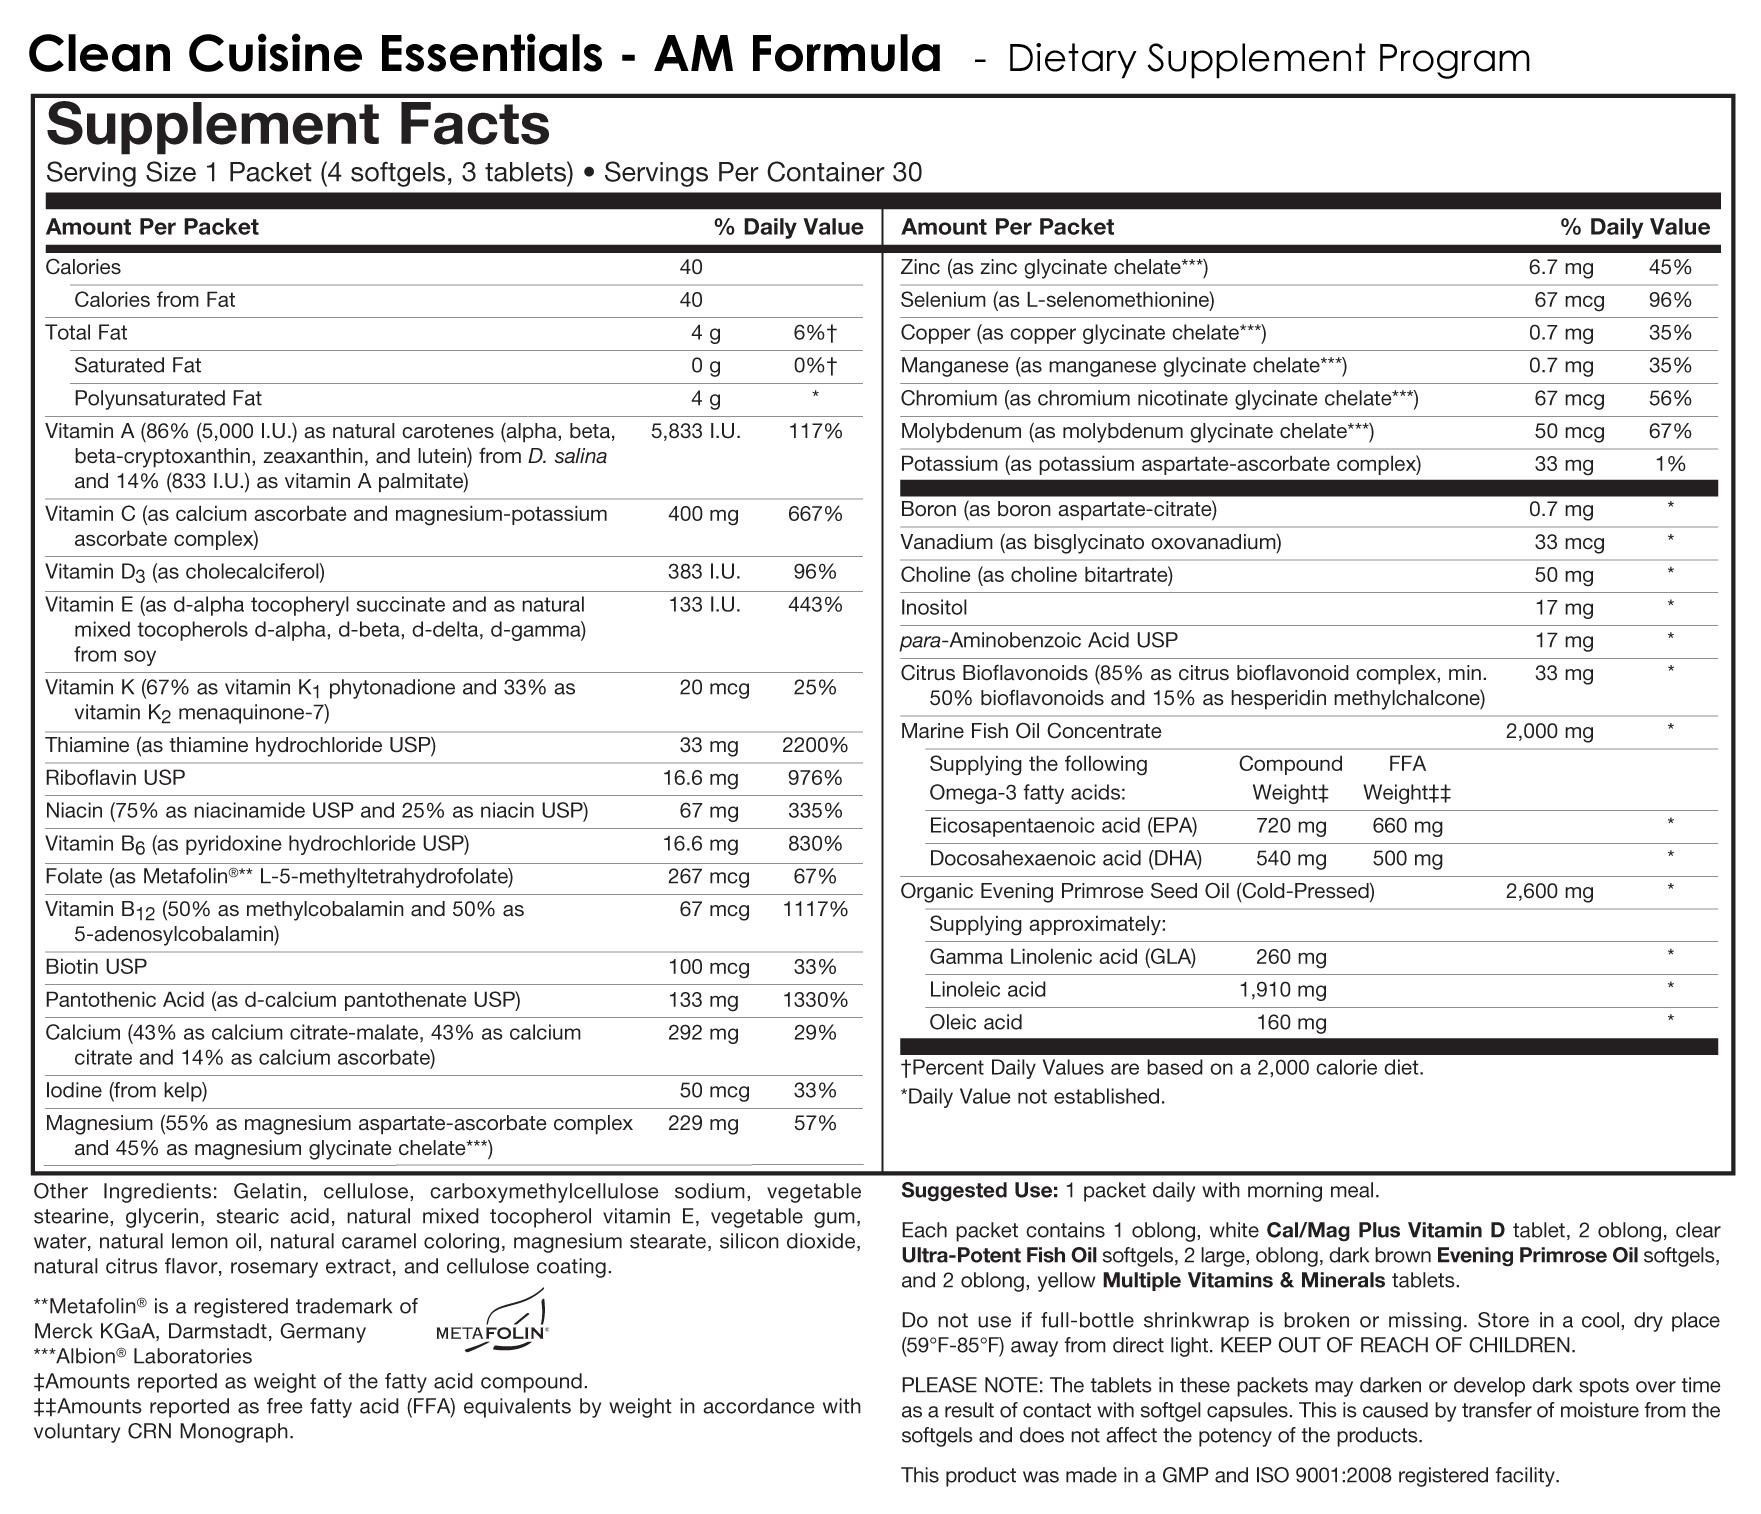 AM PM Nutritional Label